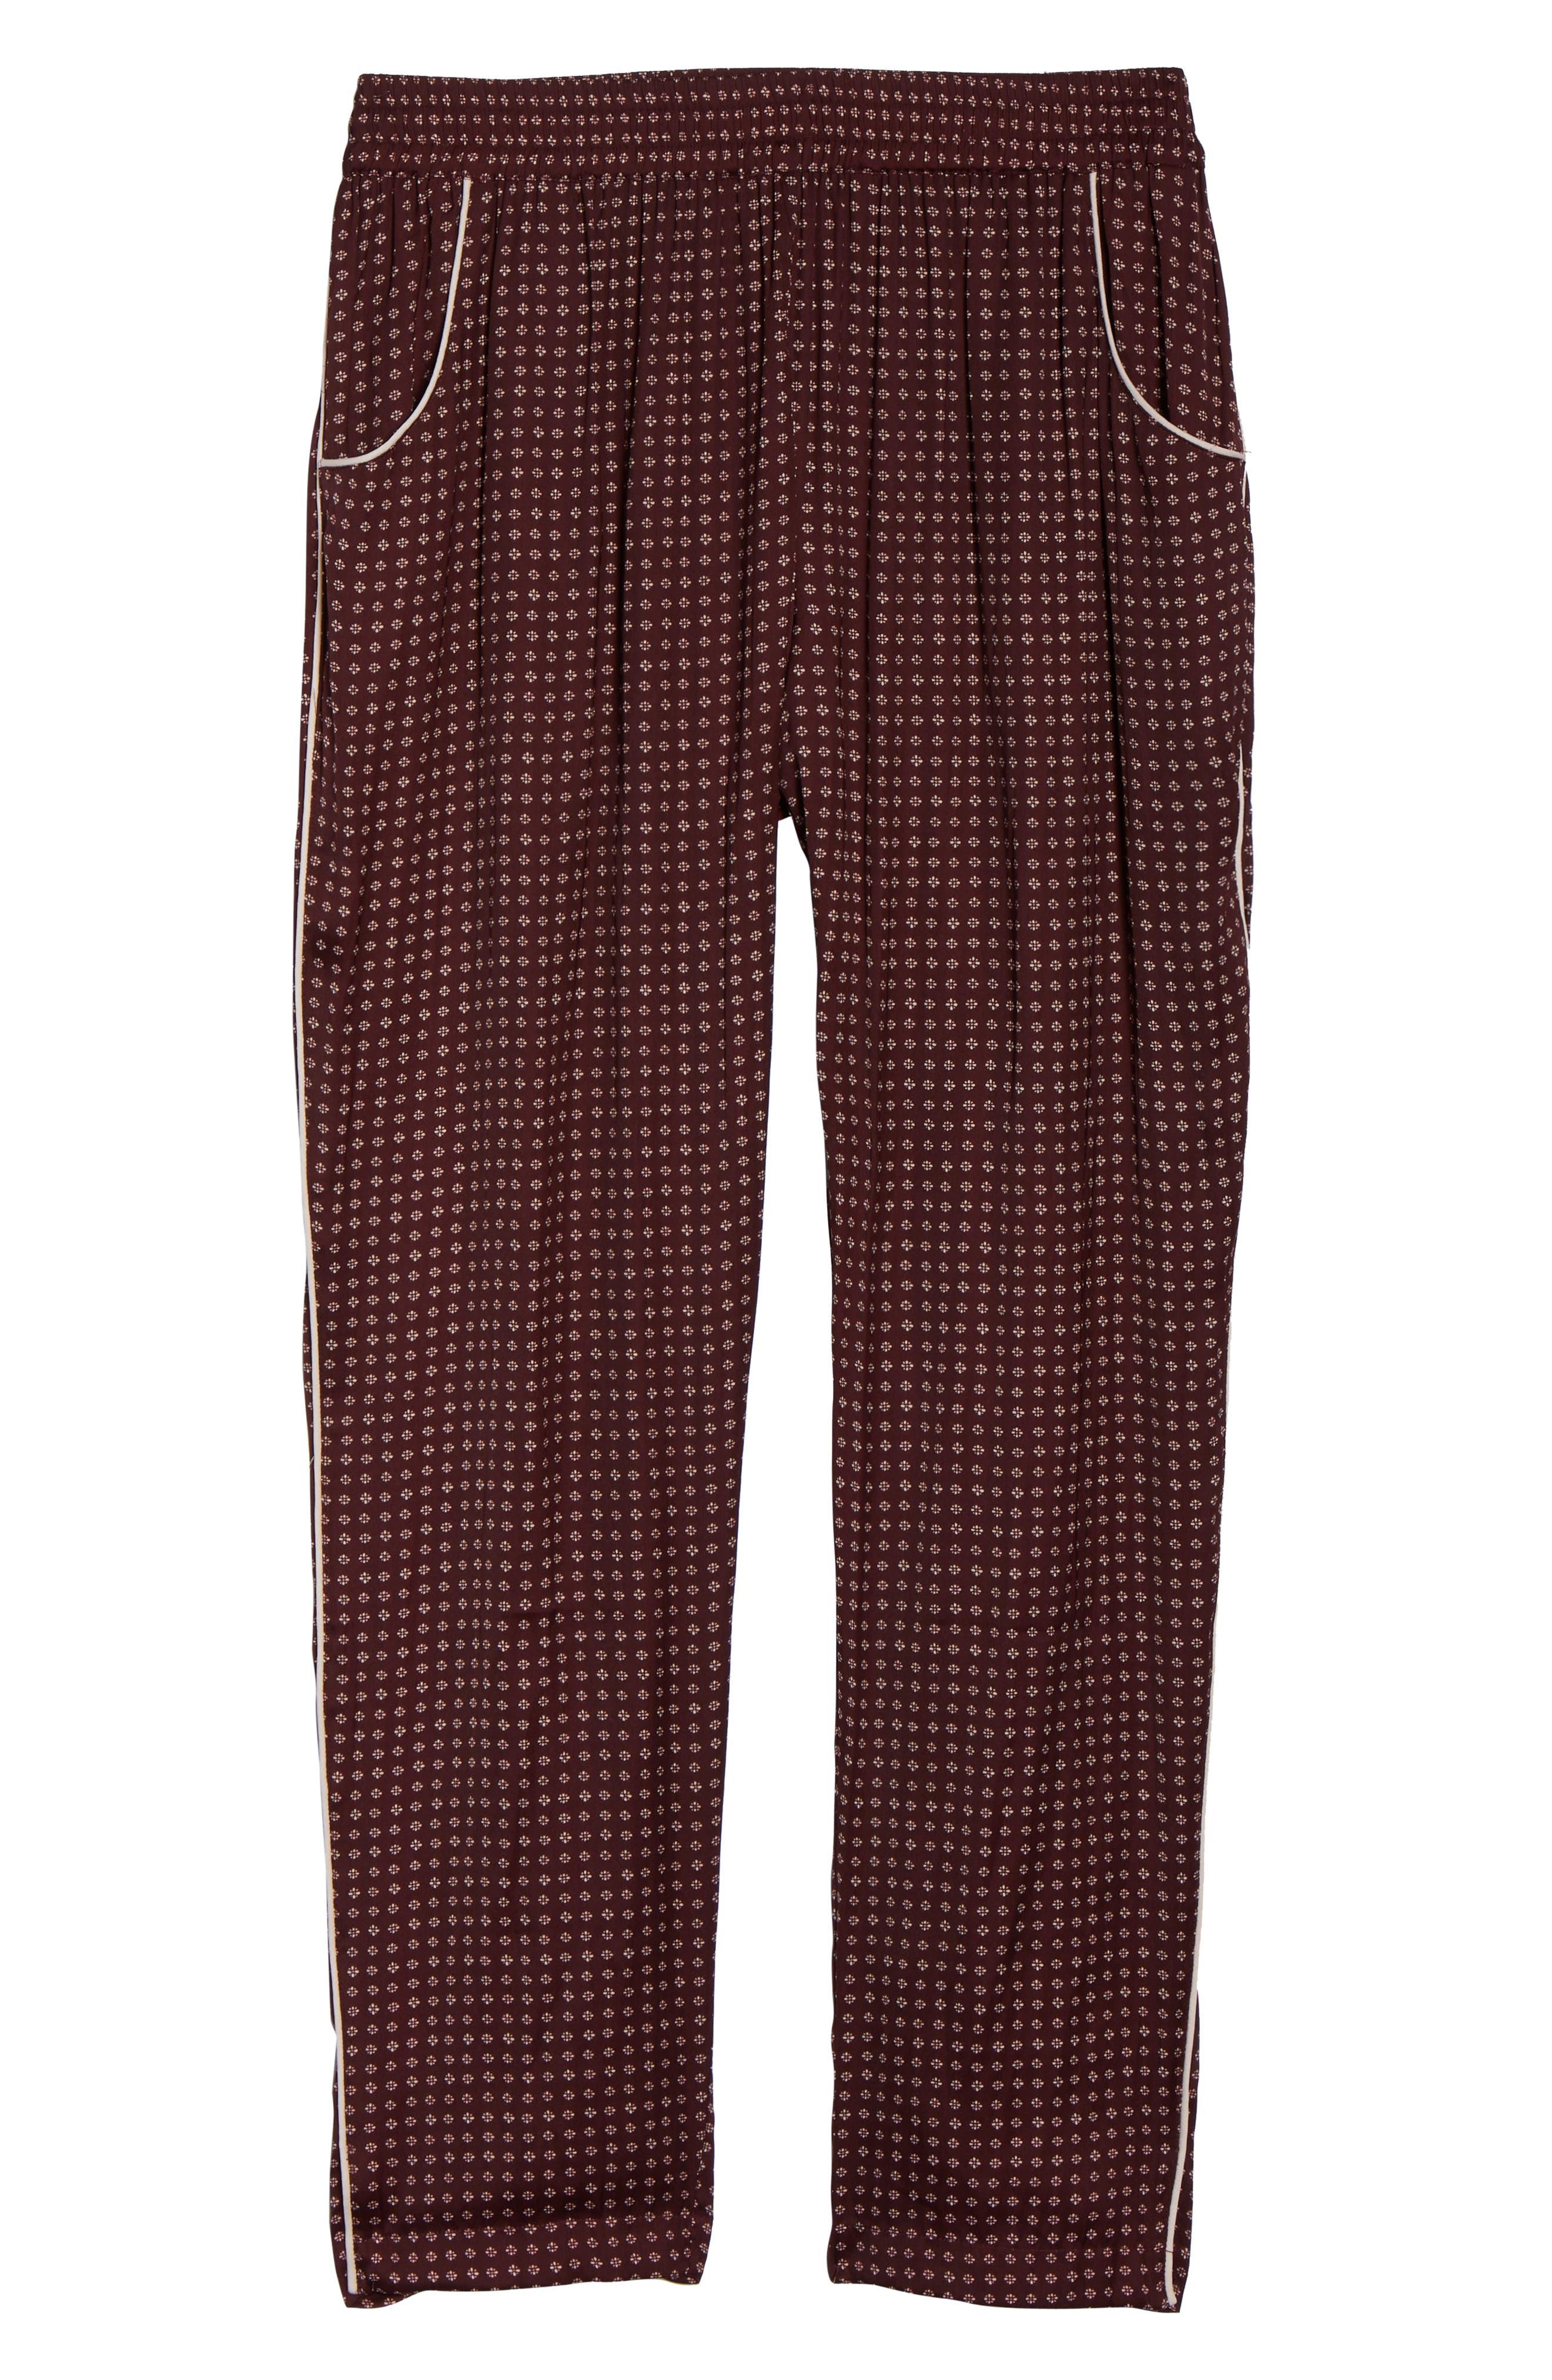 Satin Pajama Pants,                             Alternate thumbnail 7, color,                             610